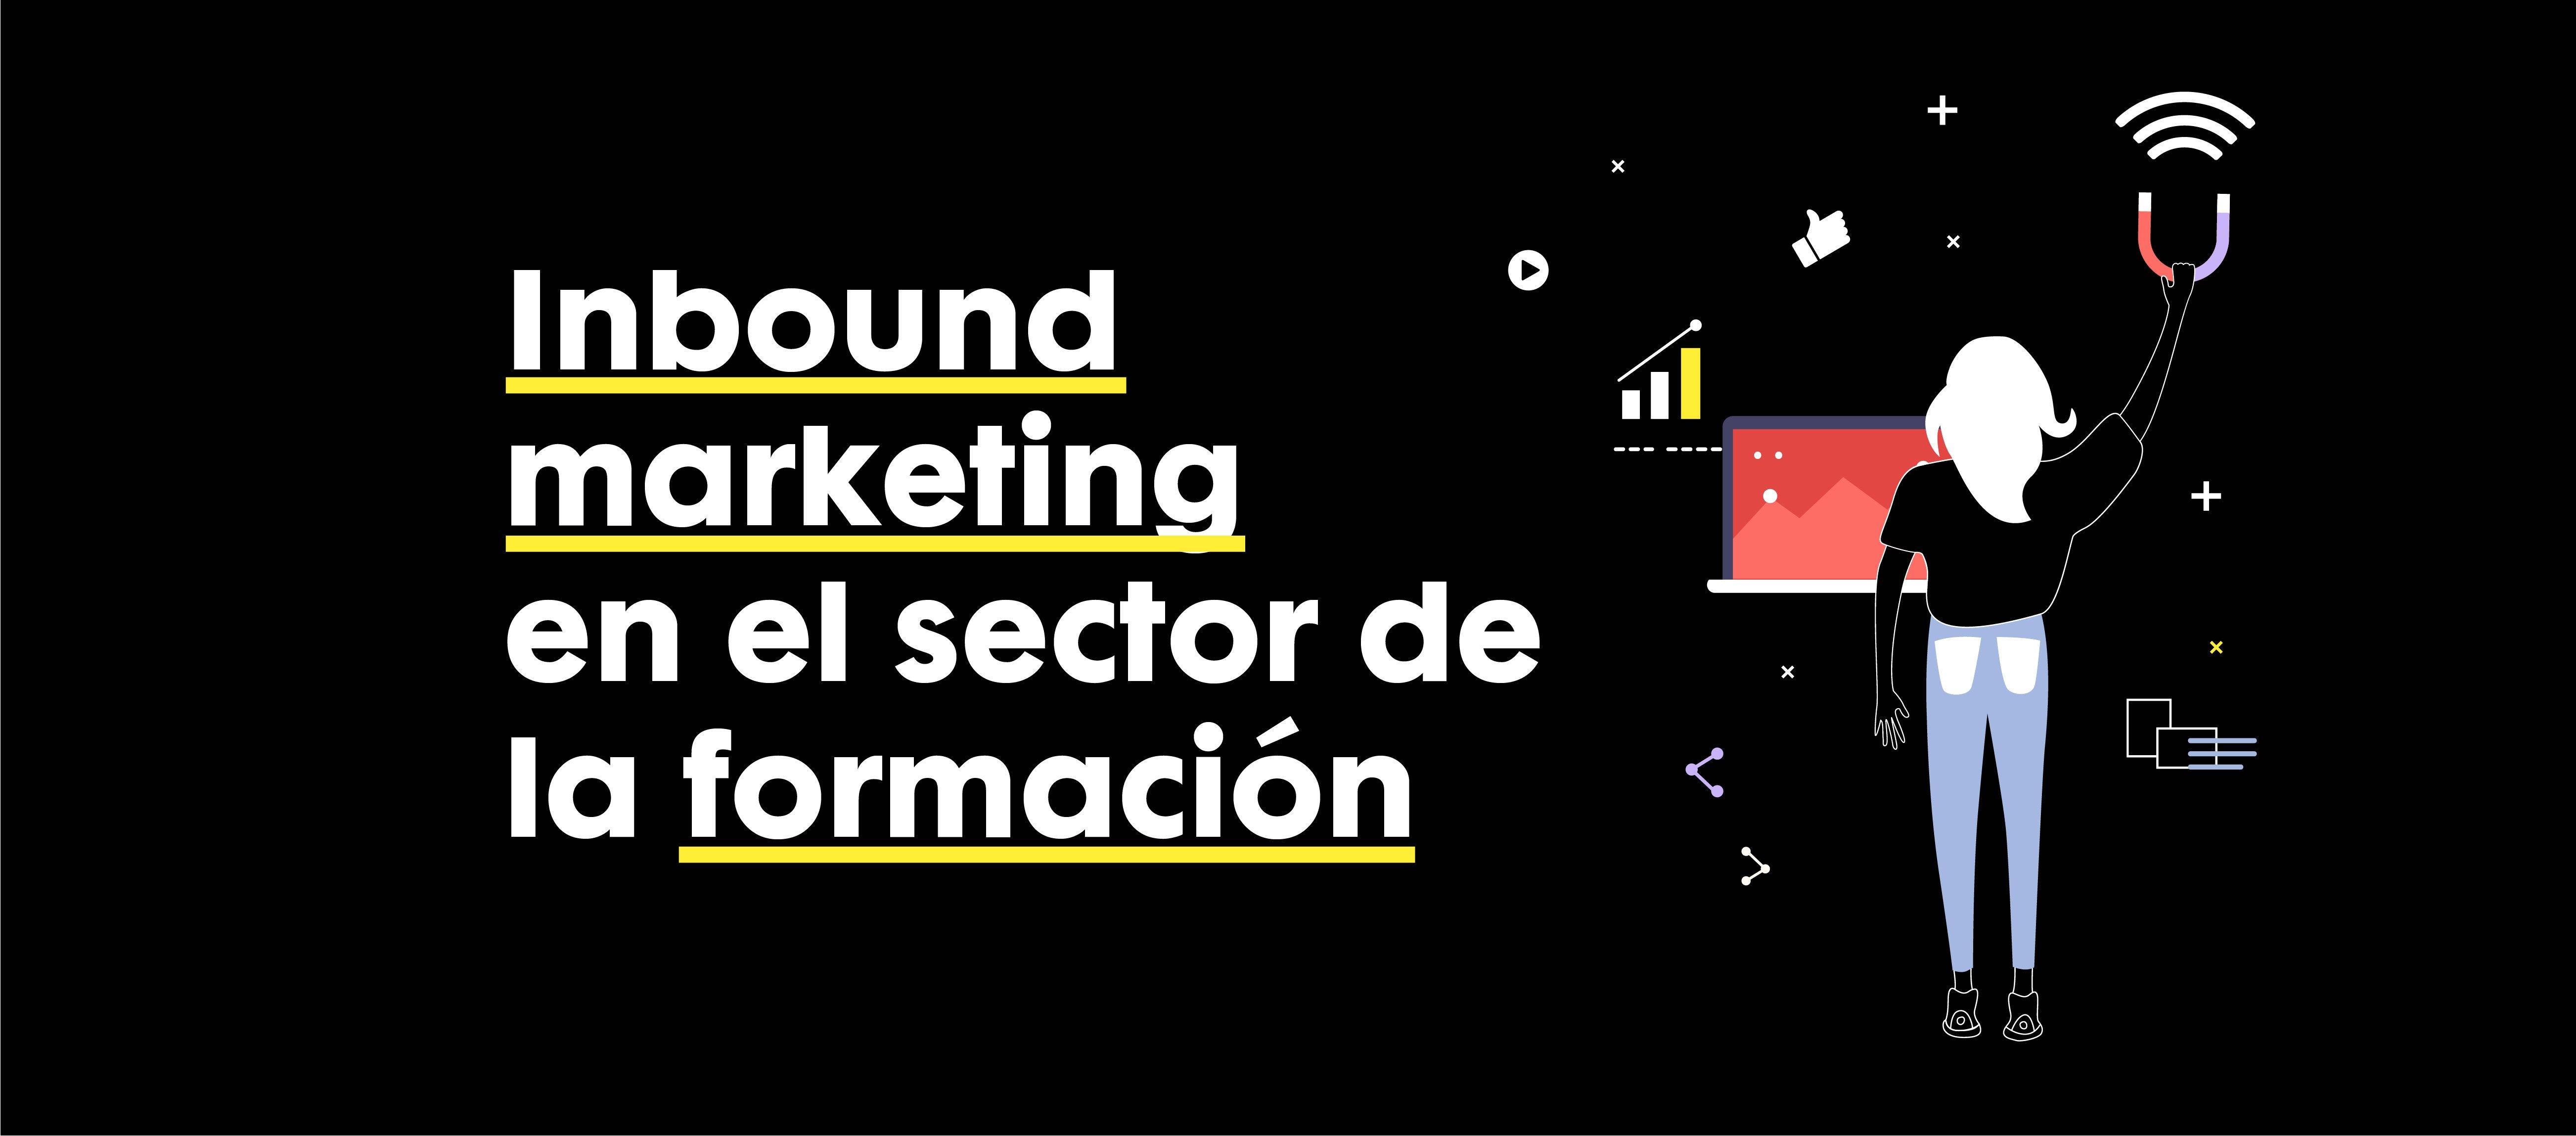 Inbound Marketing Sector Formacion Blog